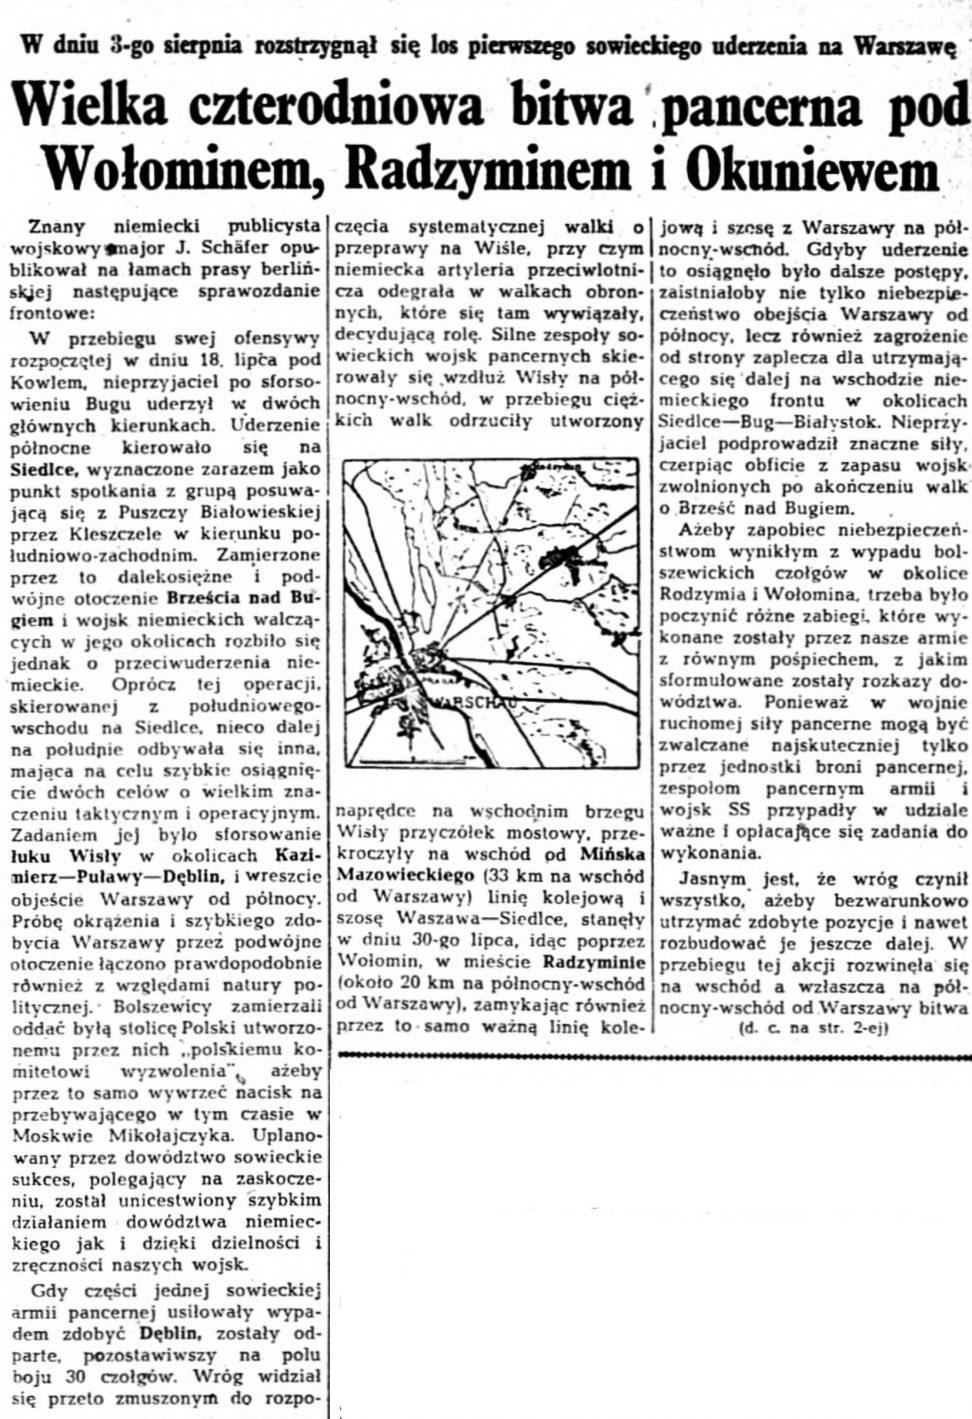 Gazeta Ilustrowana. R.5, nr 35 (27 sierpnia 1944) nr 243 a